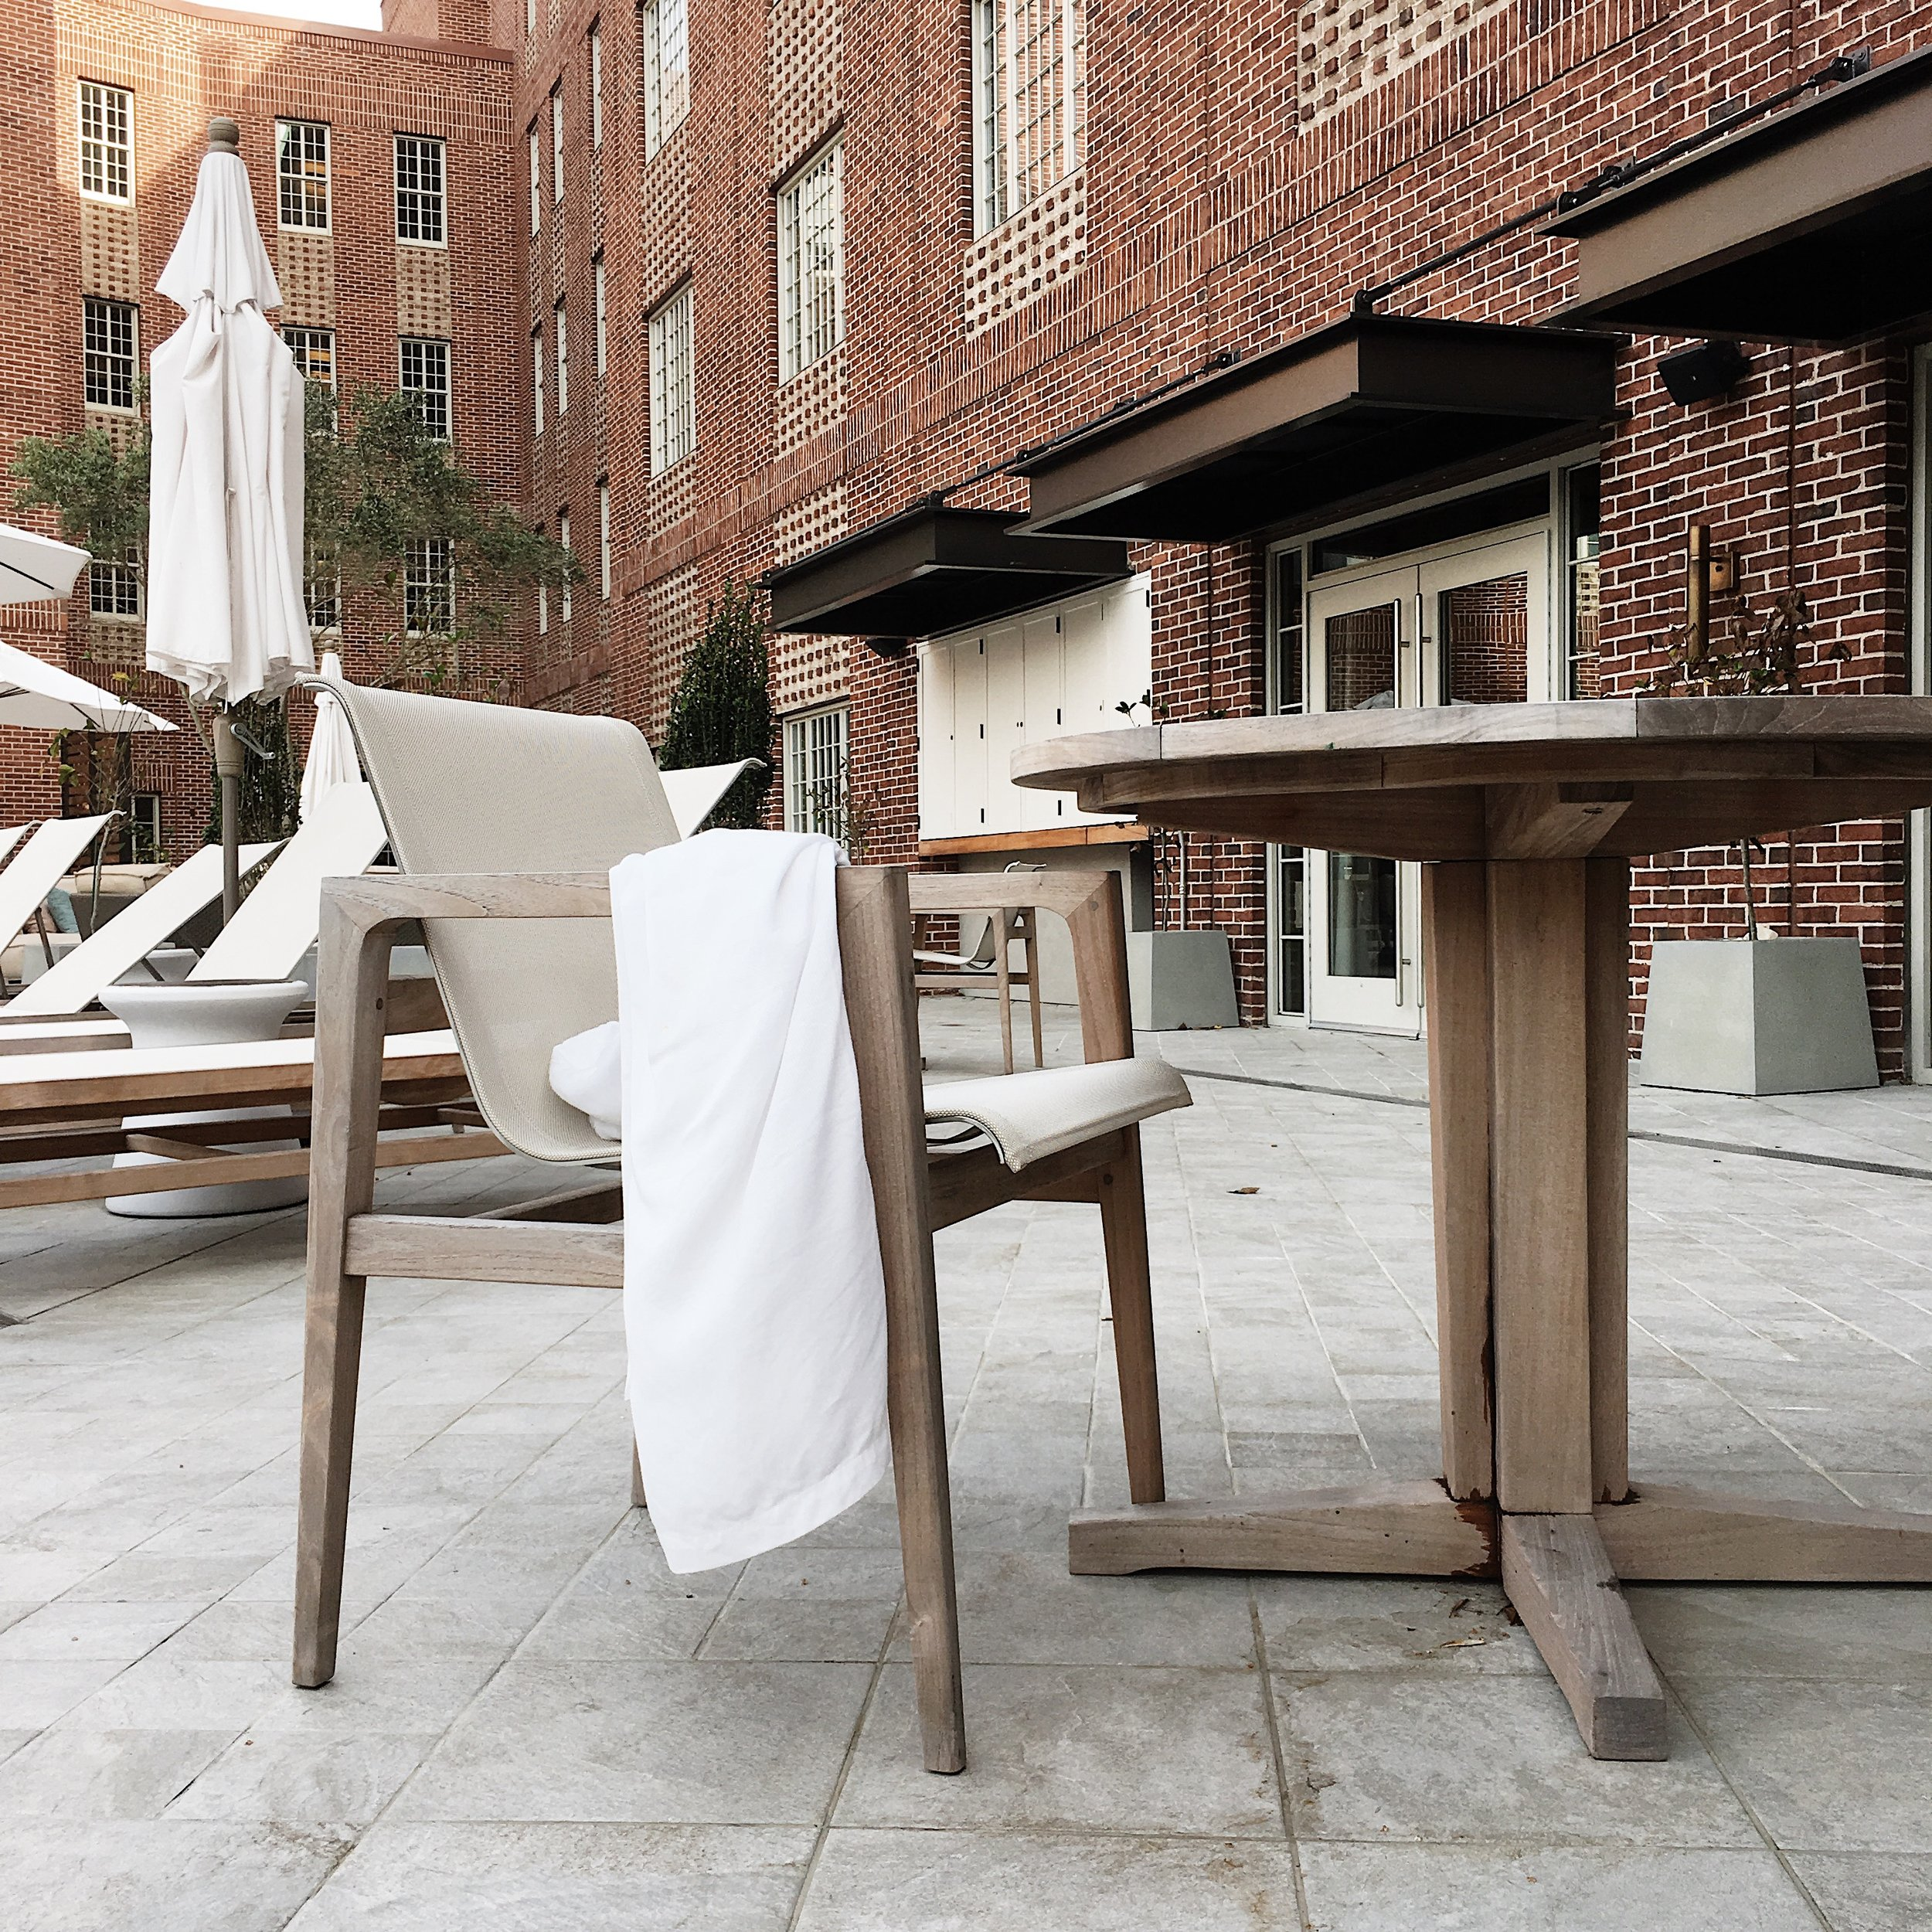 Poolside - The Alida Hotel